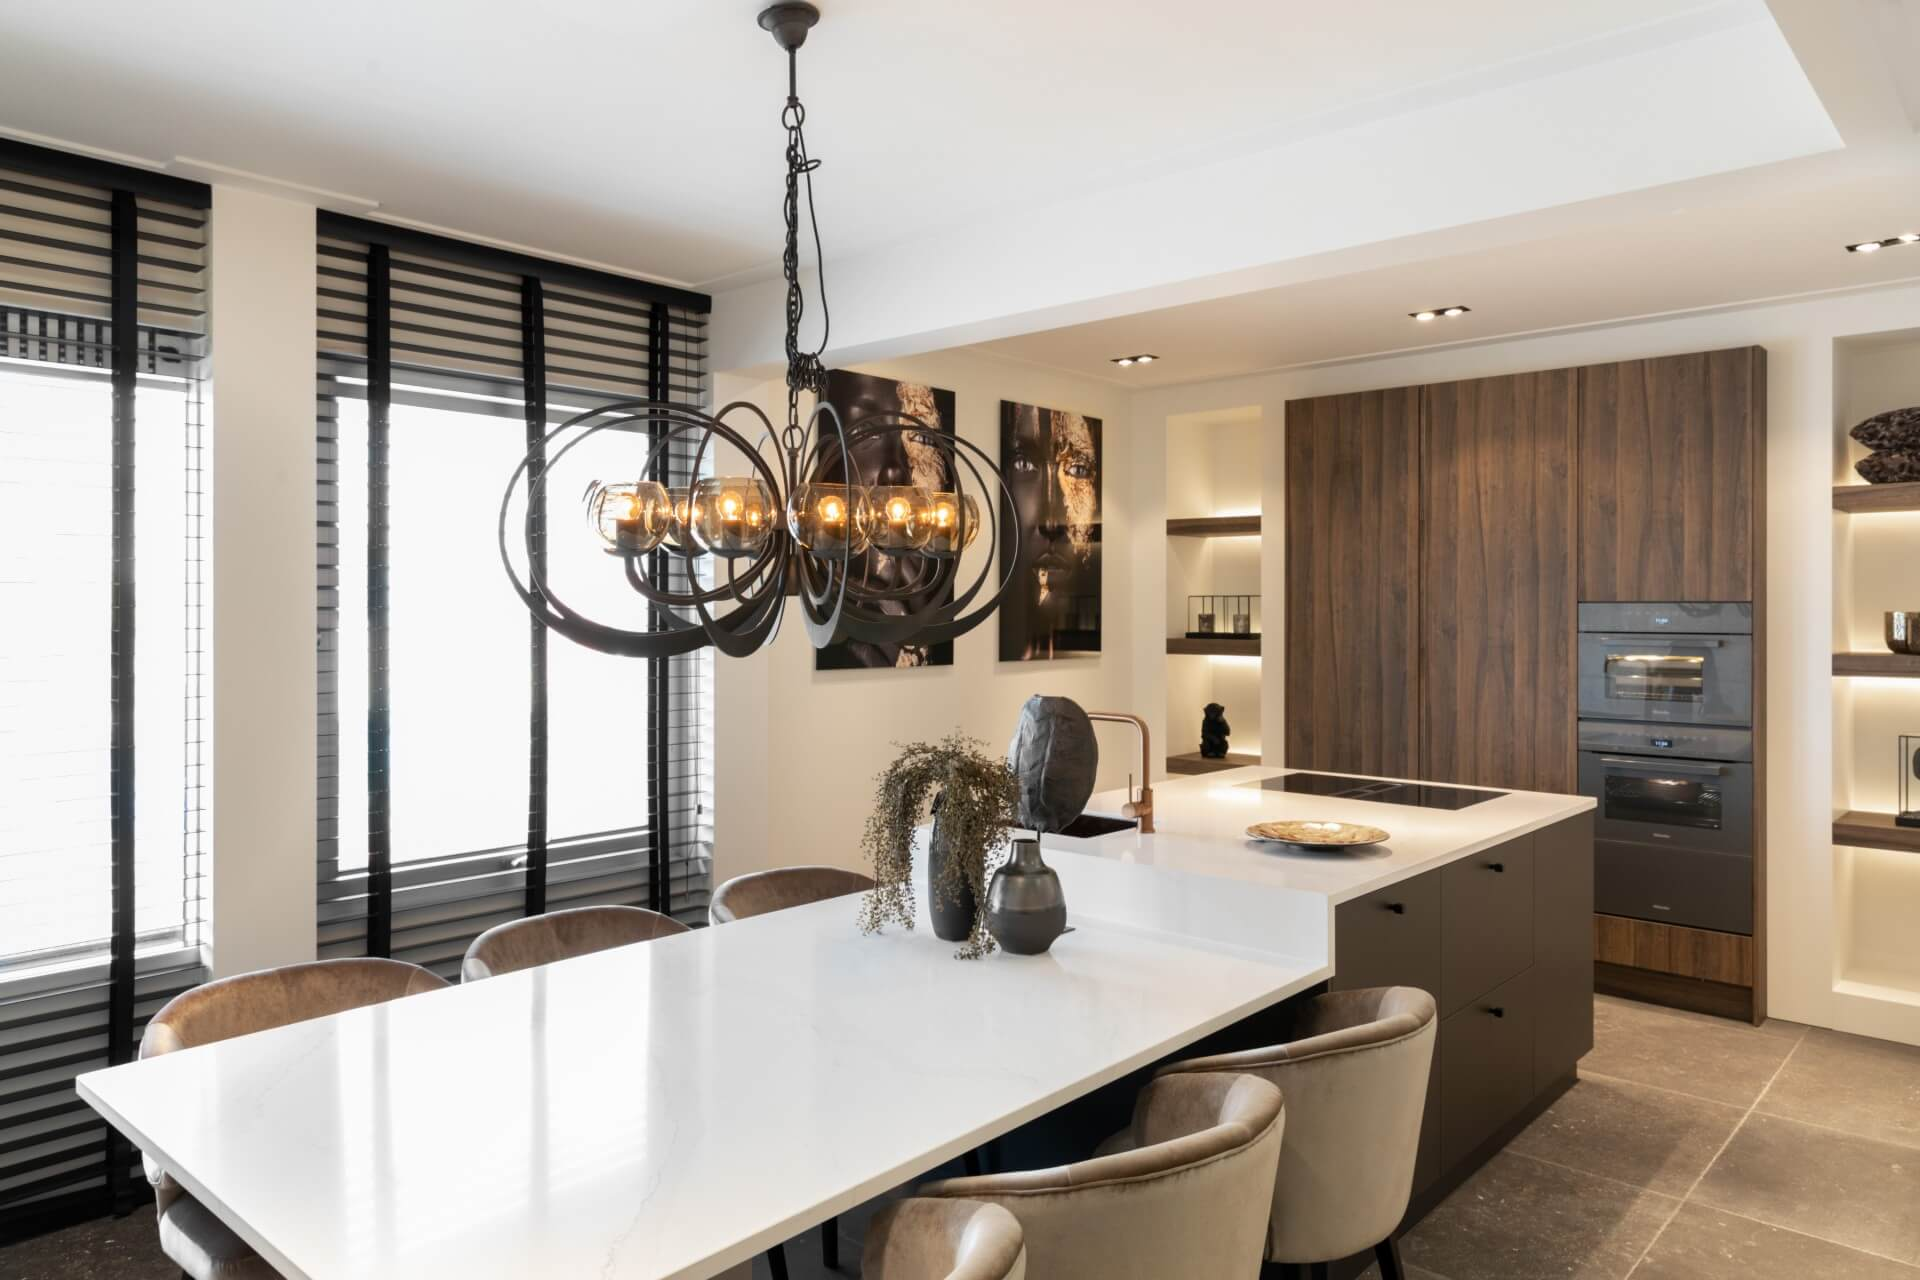 Moderne keuken met Bora kookplaat en Miele apparatuur | Barneveld